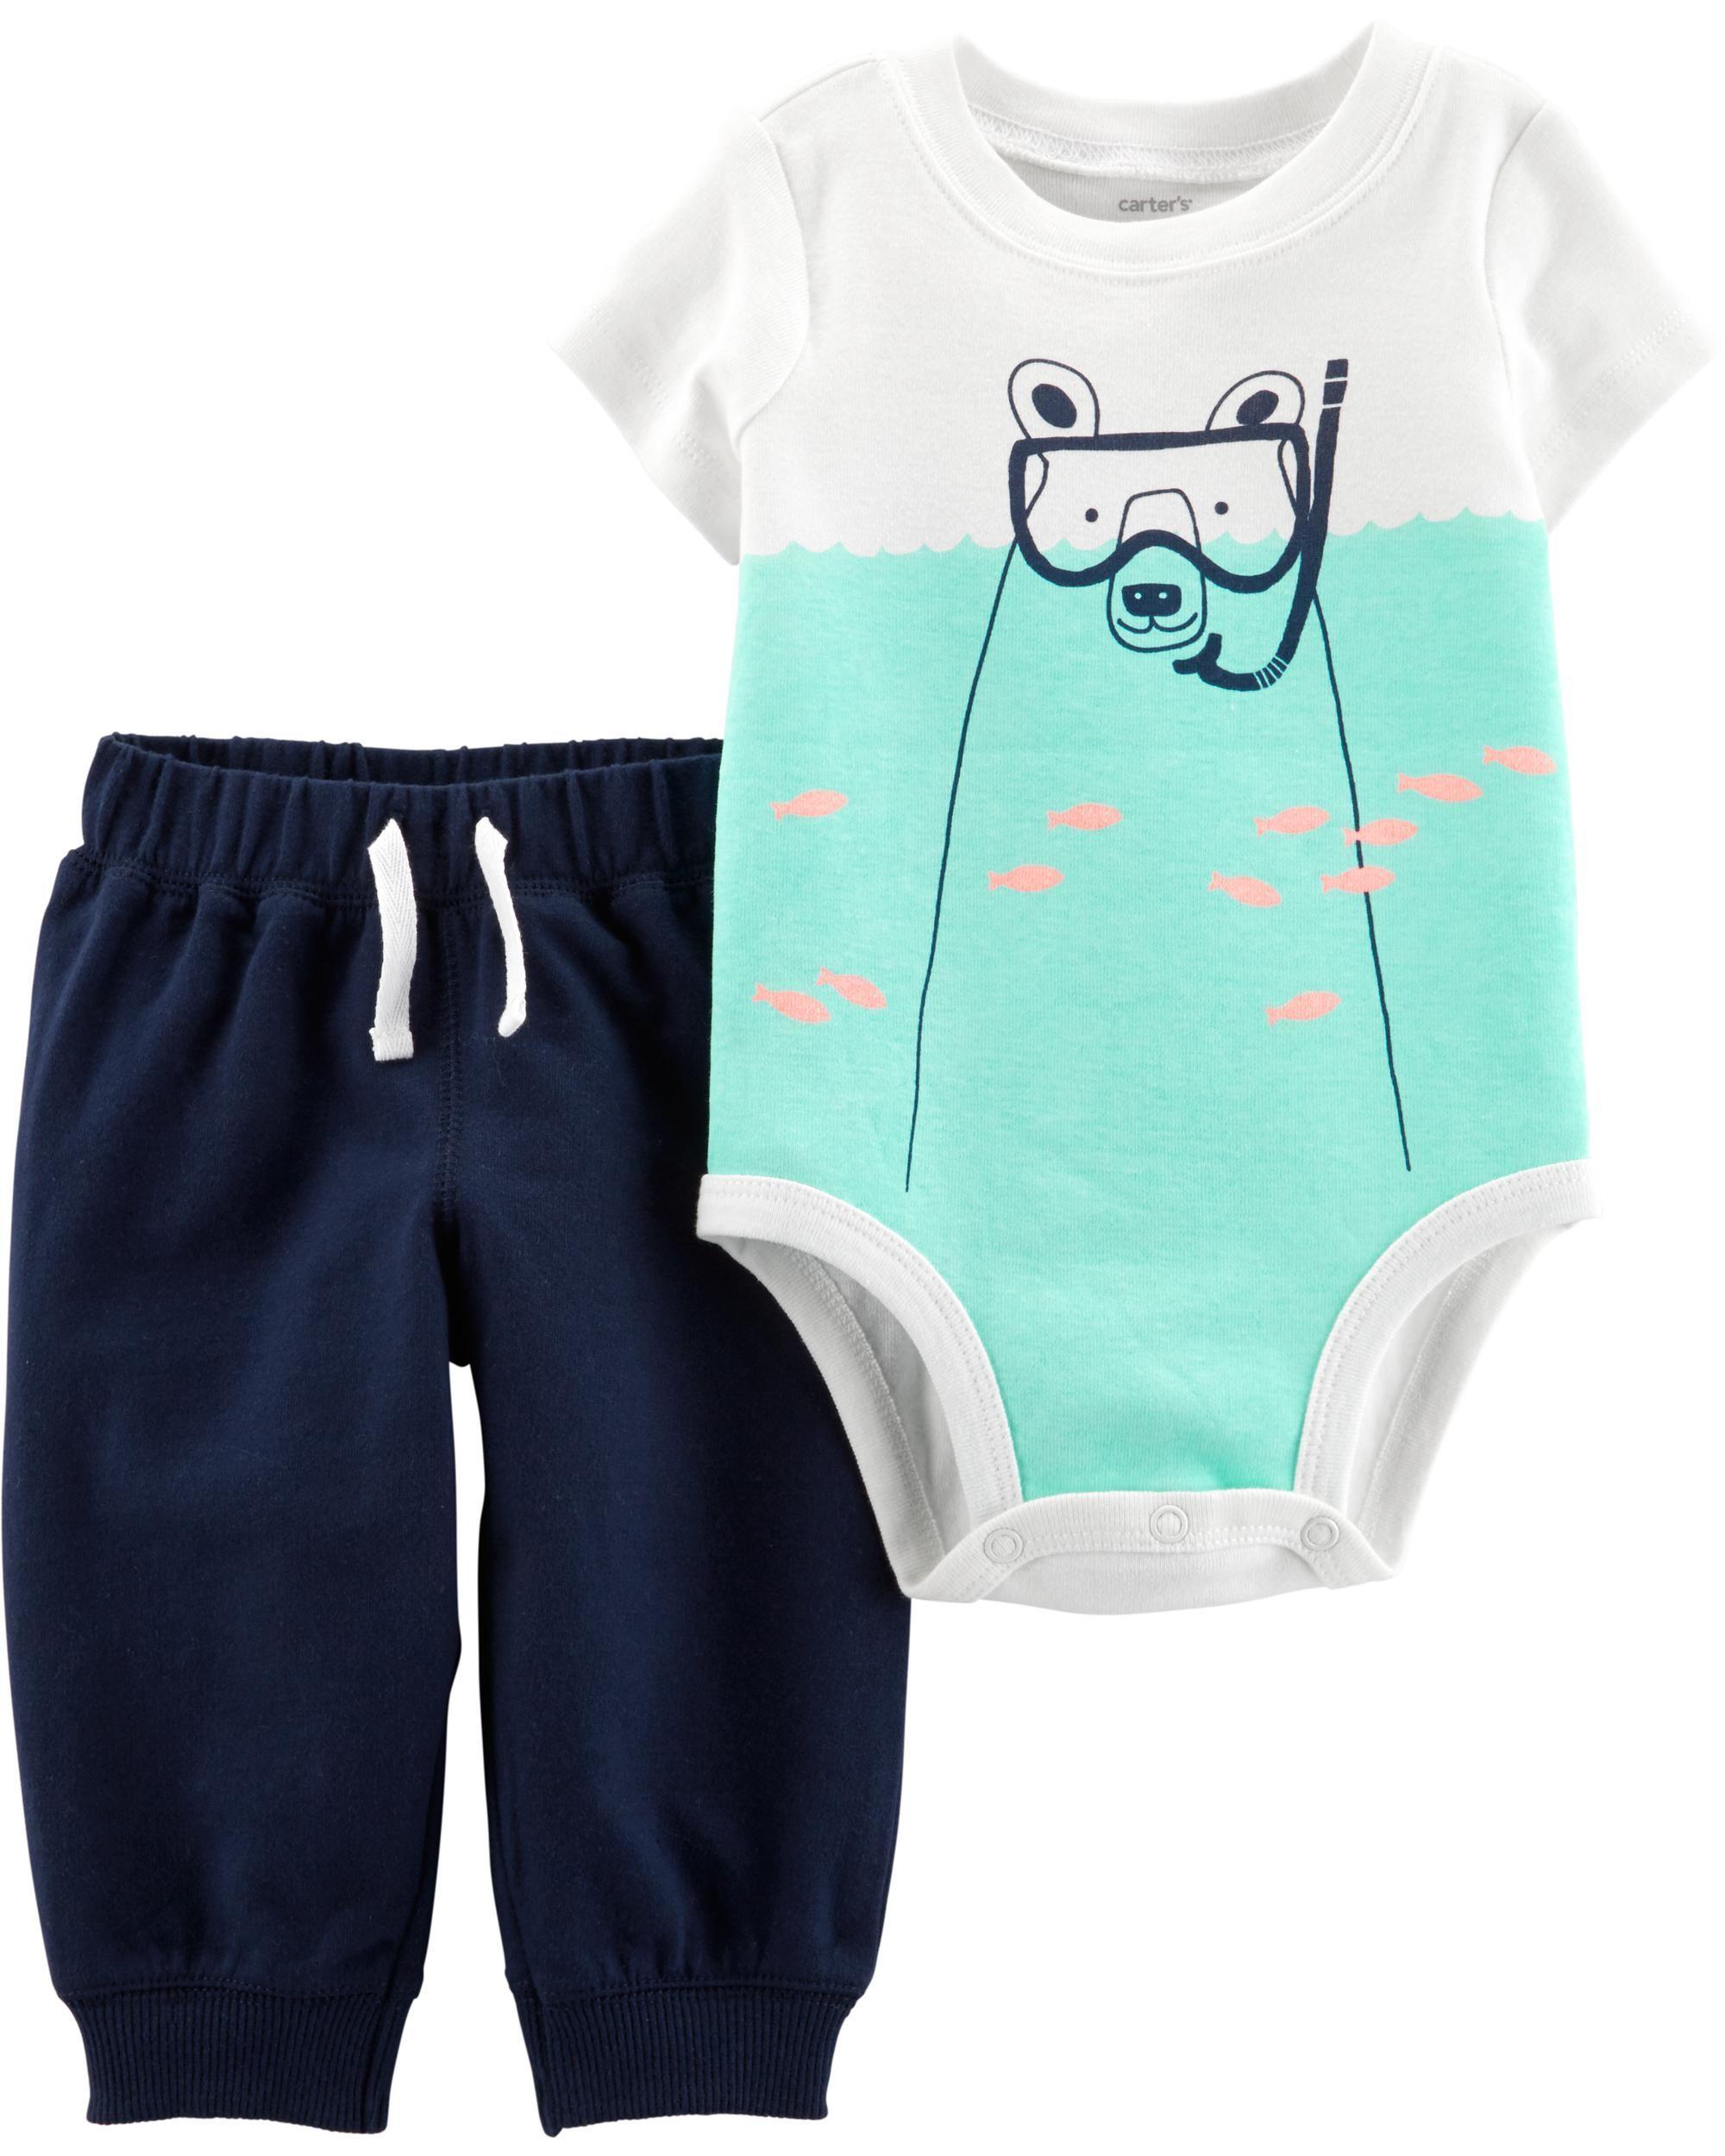 Cute Styles! Nautica Newborn Infant Baby Boy/'s 3-piece Bodysuit and Pants Set